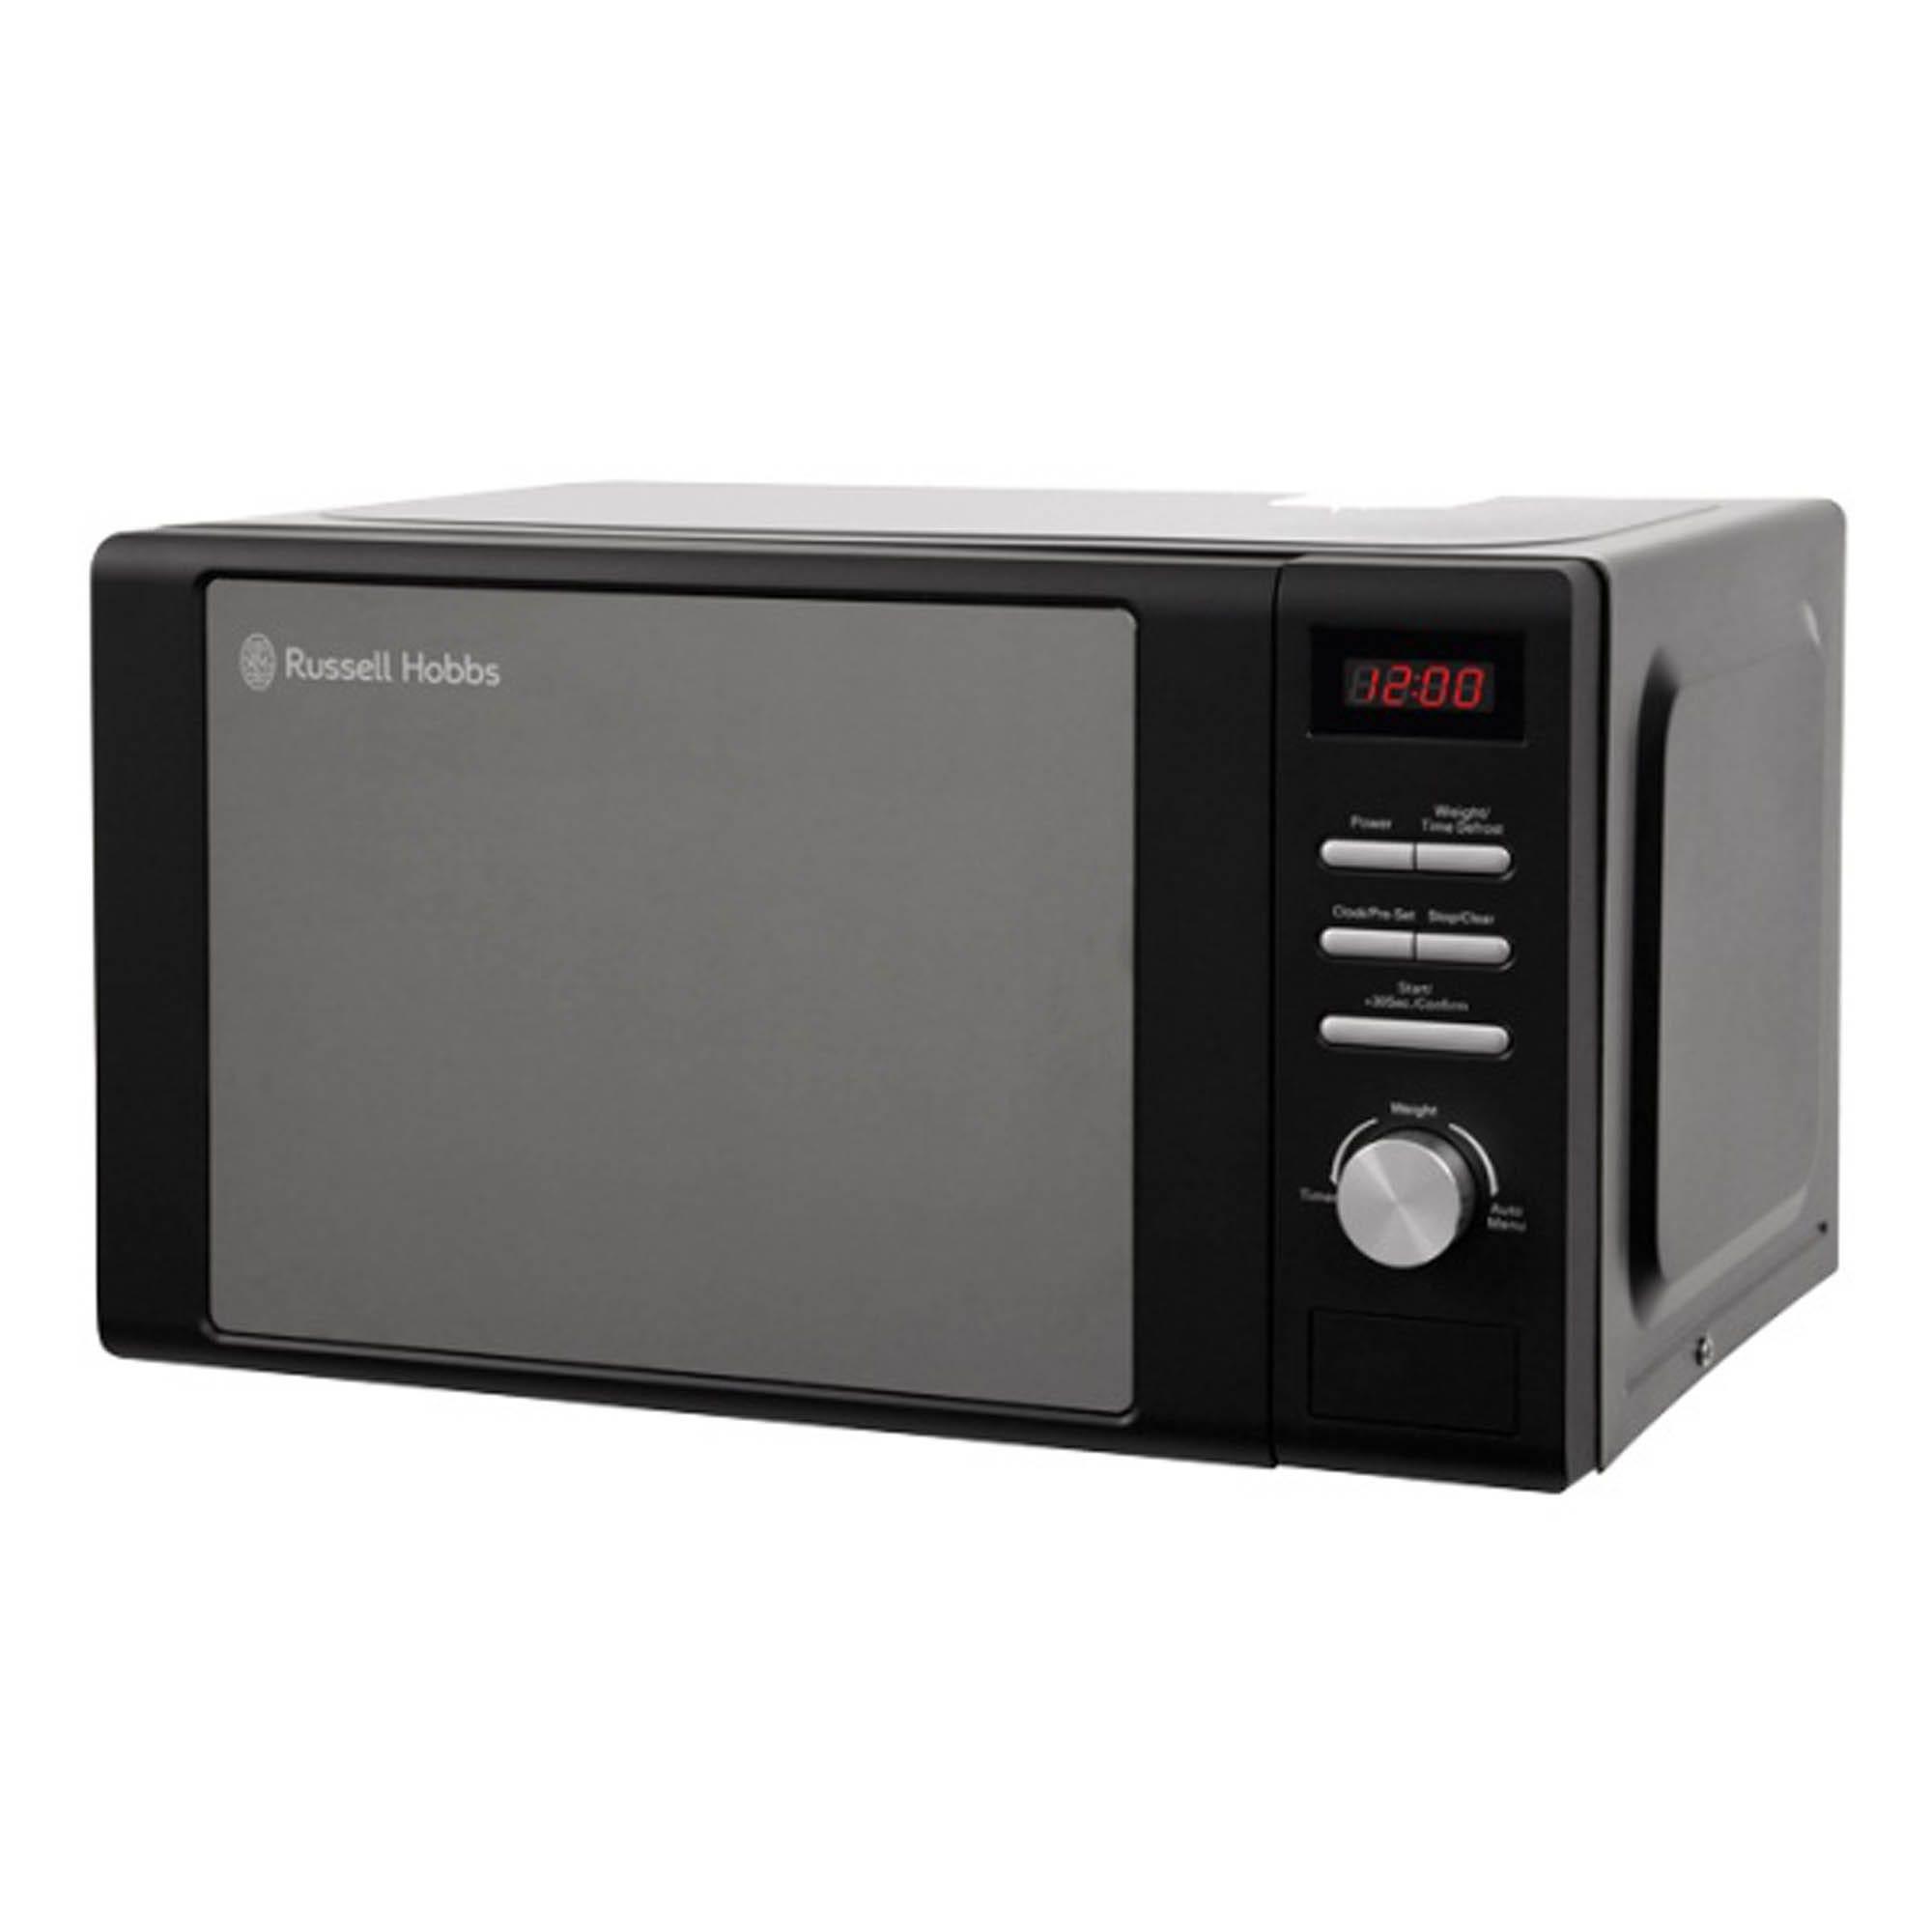 Russell Hobbs RHM2064MB 20 Litre Digital Microwave - Matt Black